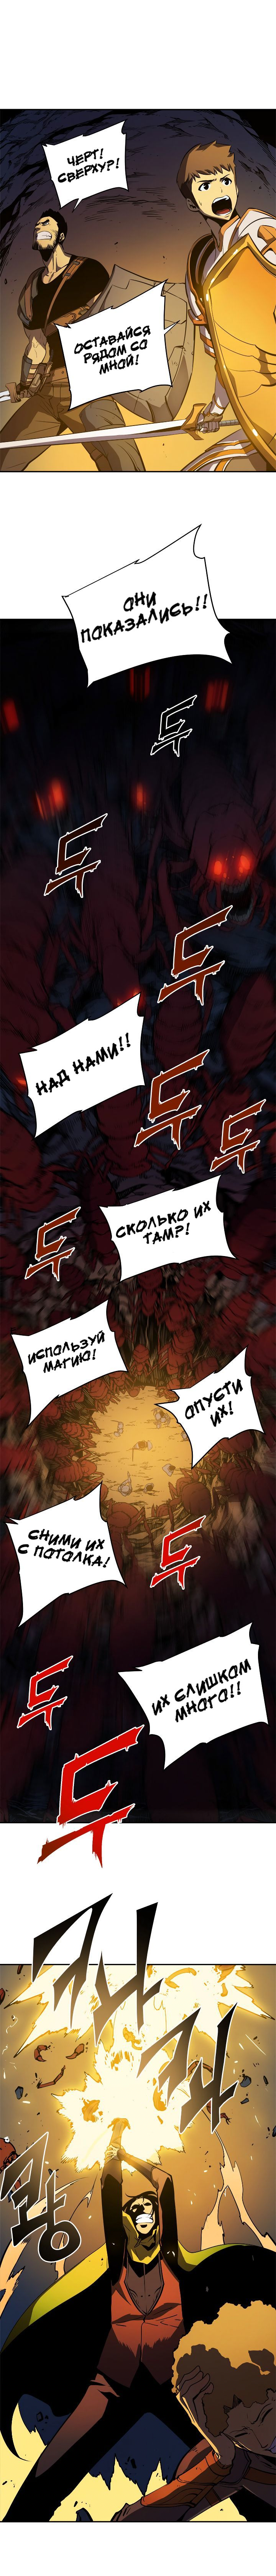 https://r1.ninemanga.com/comics/pic3/13/35341/1292549/1545648821773.jpg Page 10